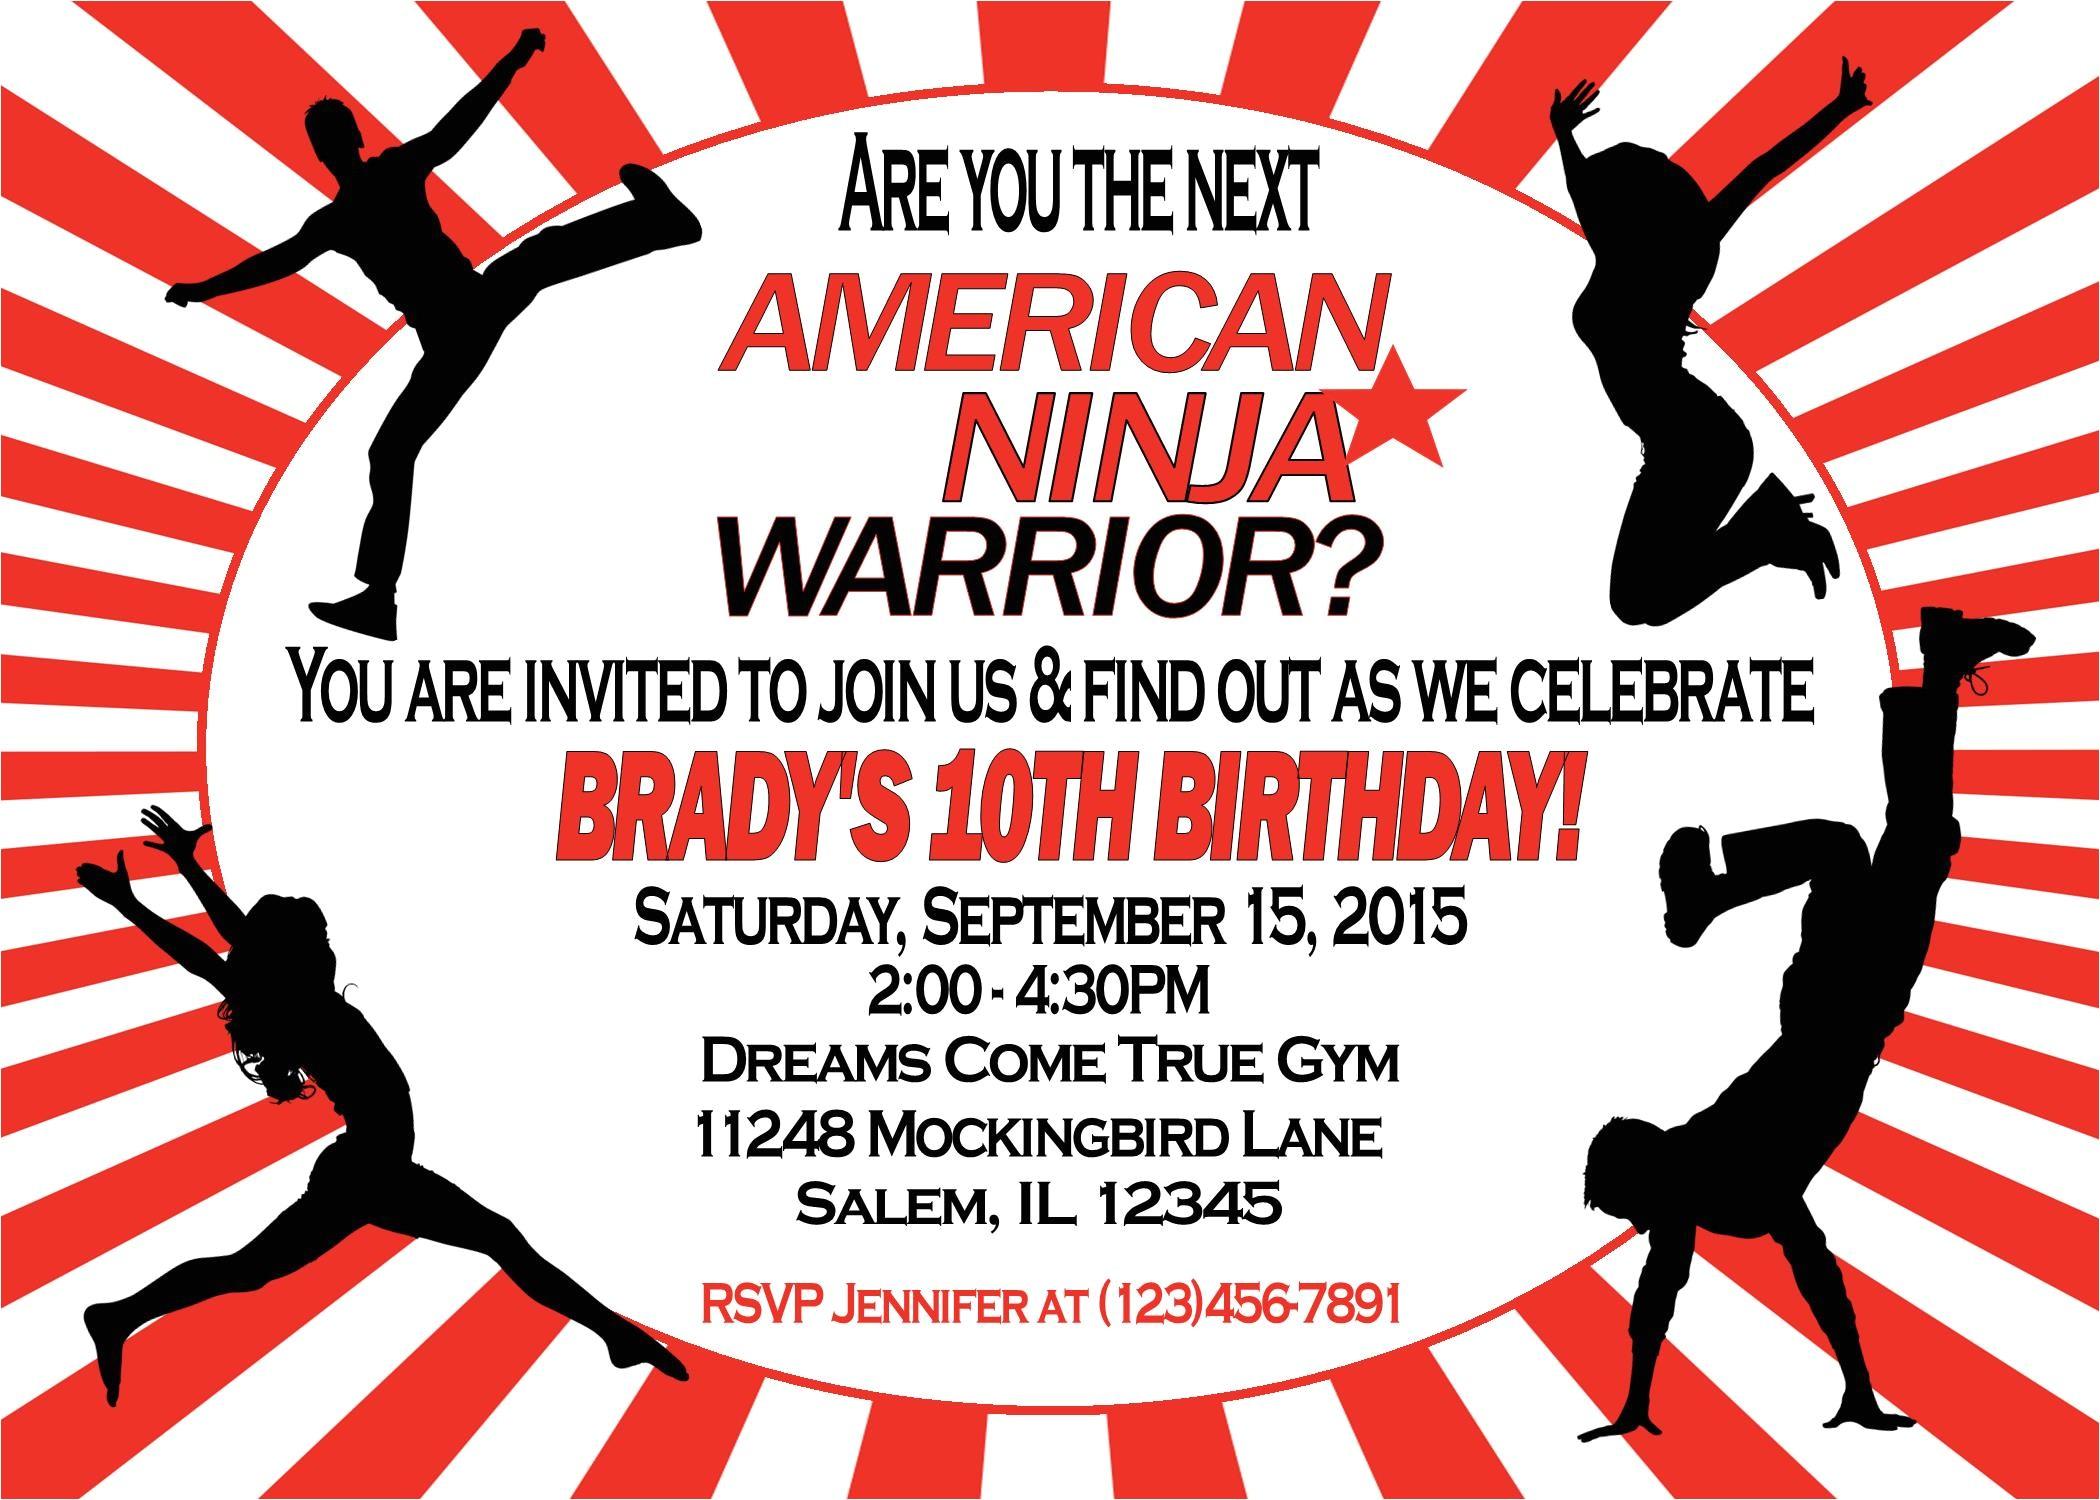 American Ninja Warrior Party Invitations American Ninja Warrior Invitation